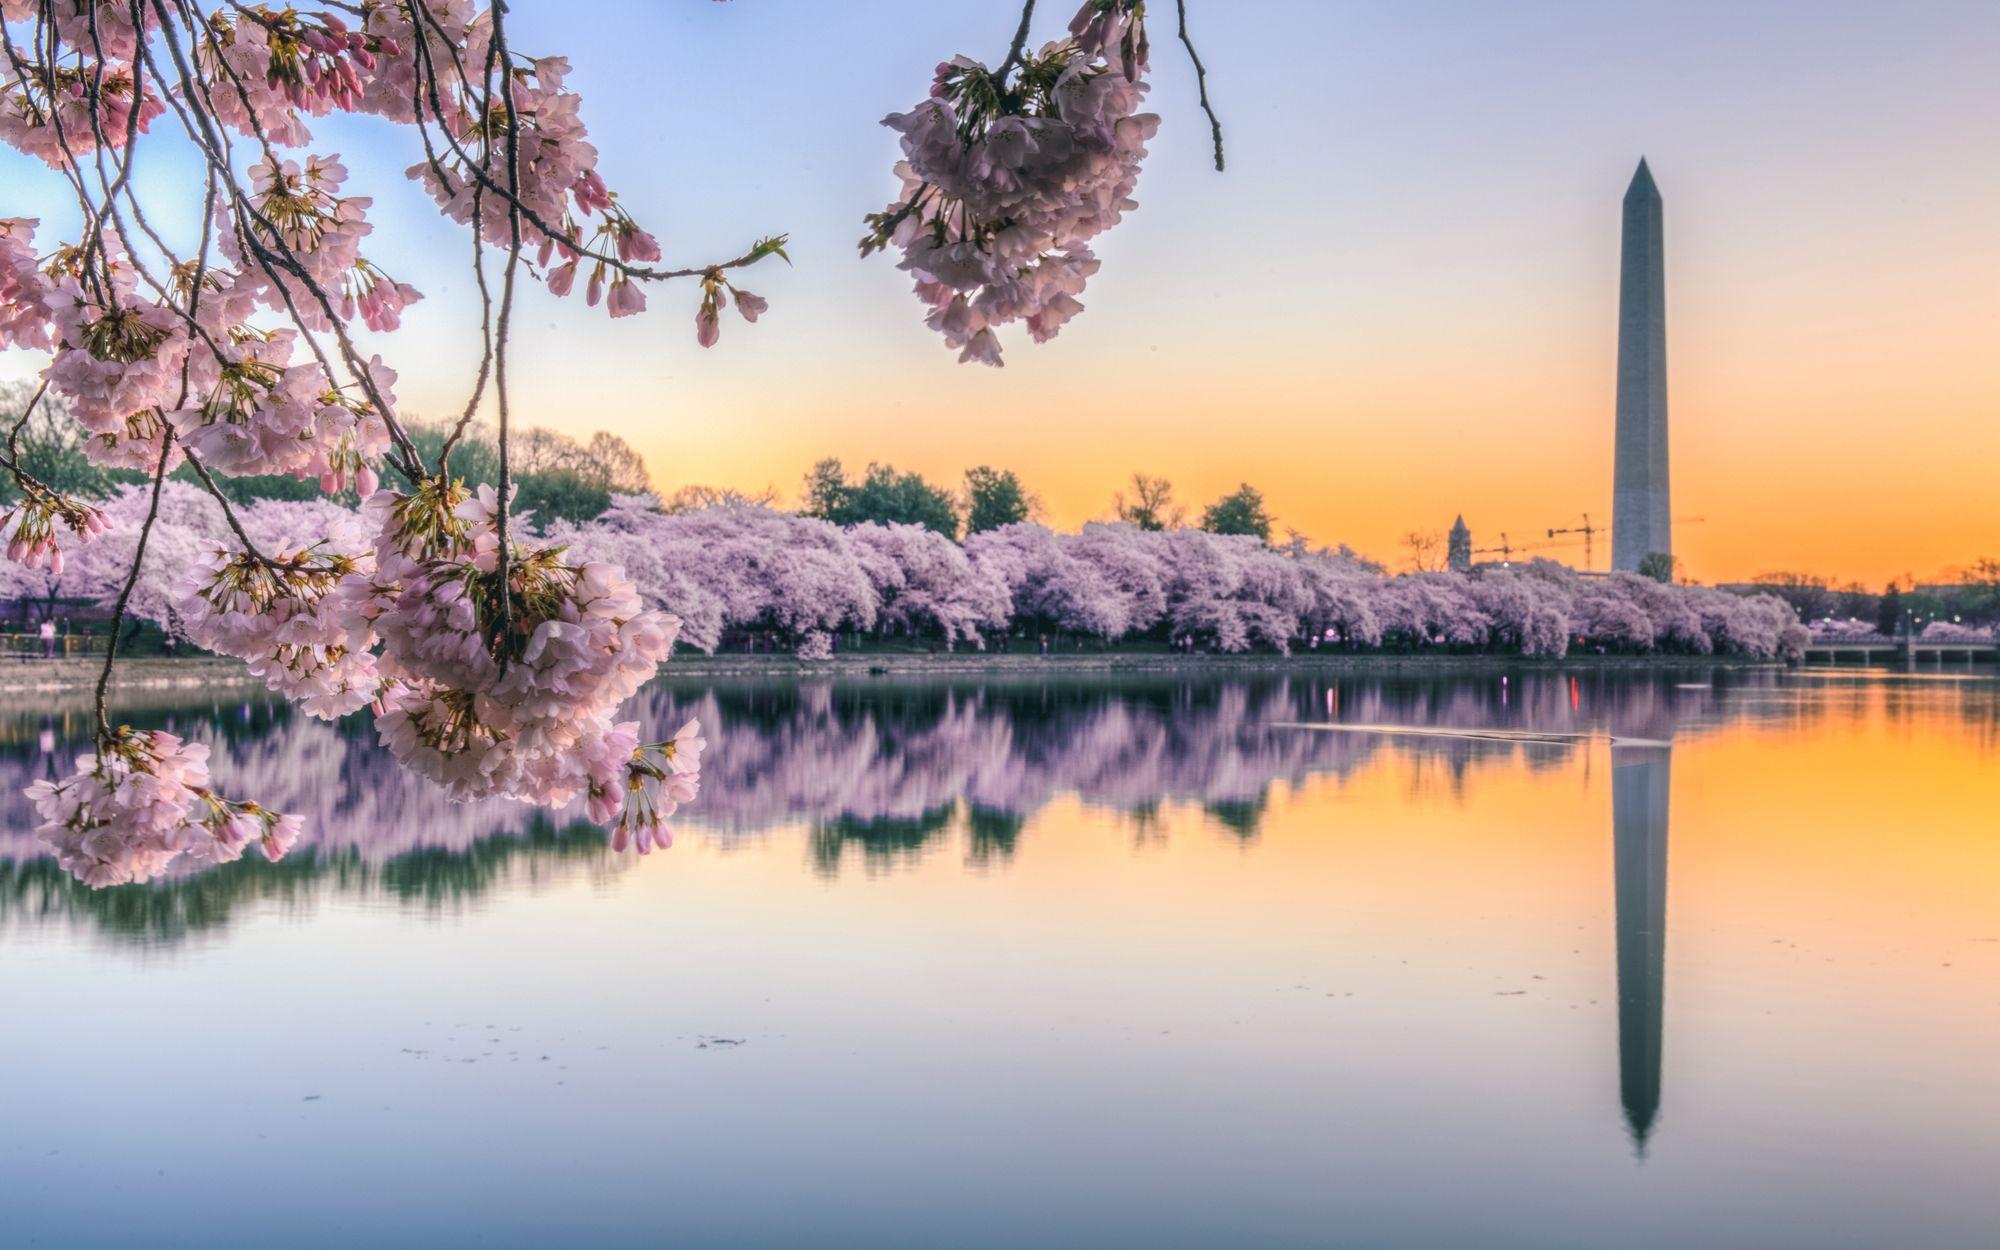 Washington DC vacation rental alternatives for the 2021 Cherry Blossom Festival